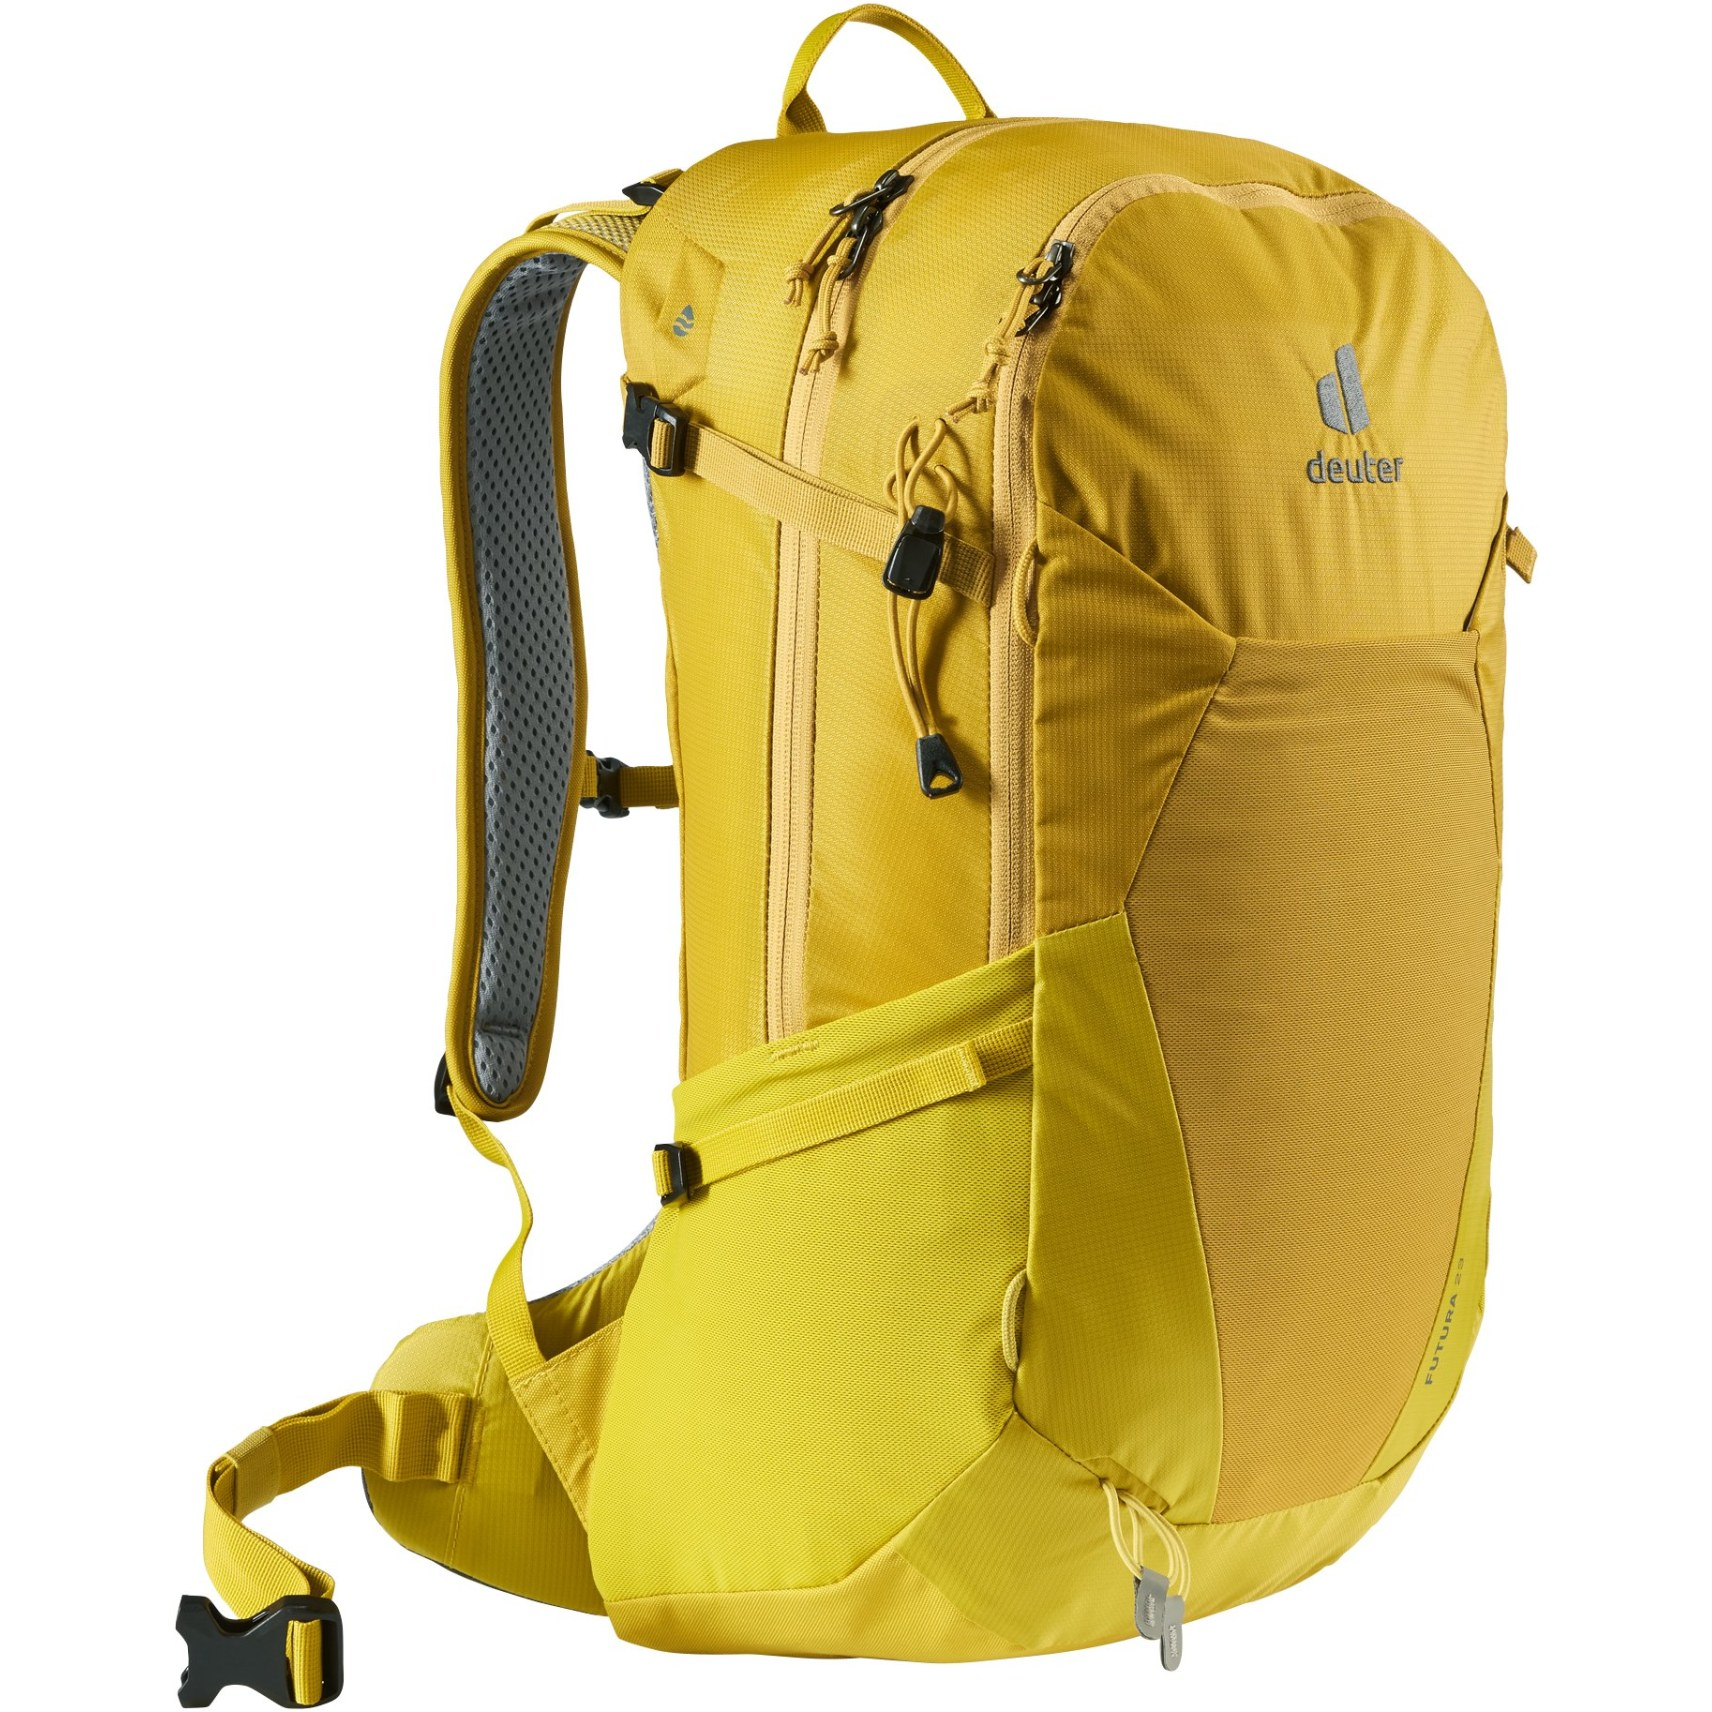 Deuter Futura 23 Backpack - turmeric-greencurry